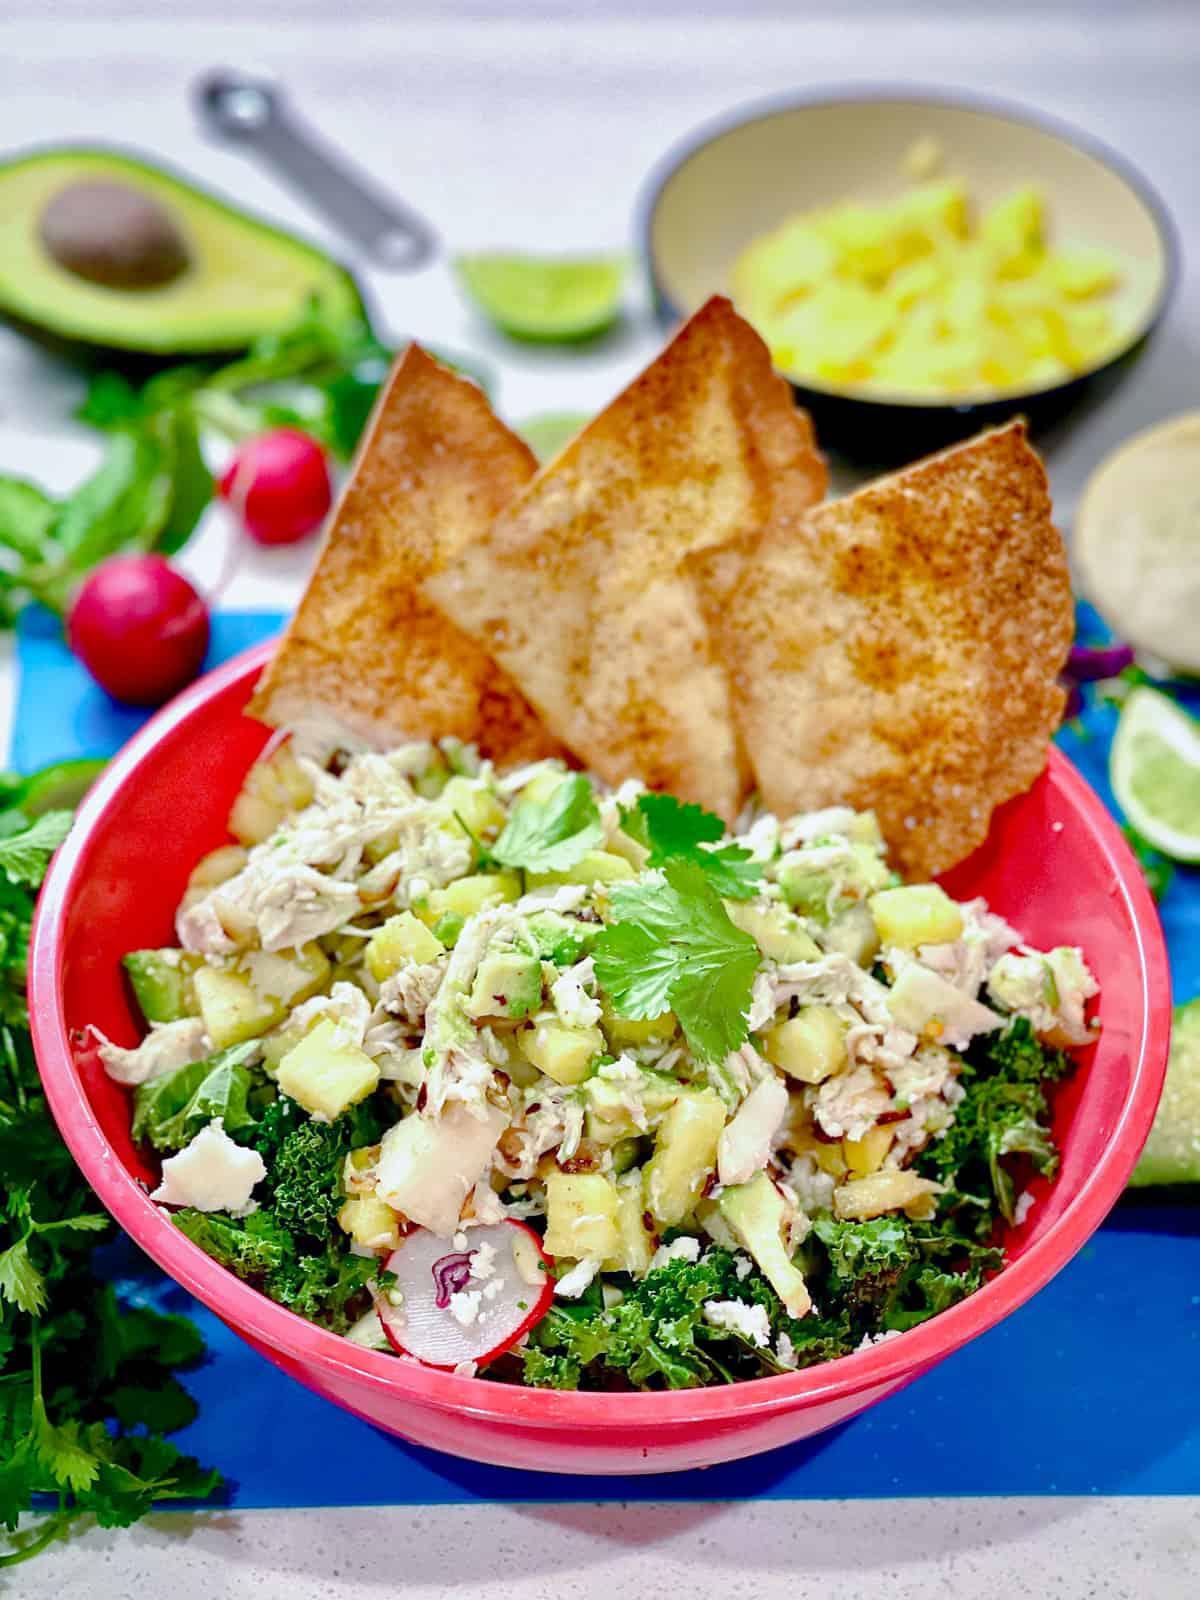 Tropical Chicken Tostada Salad